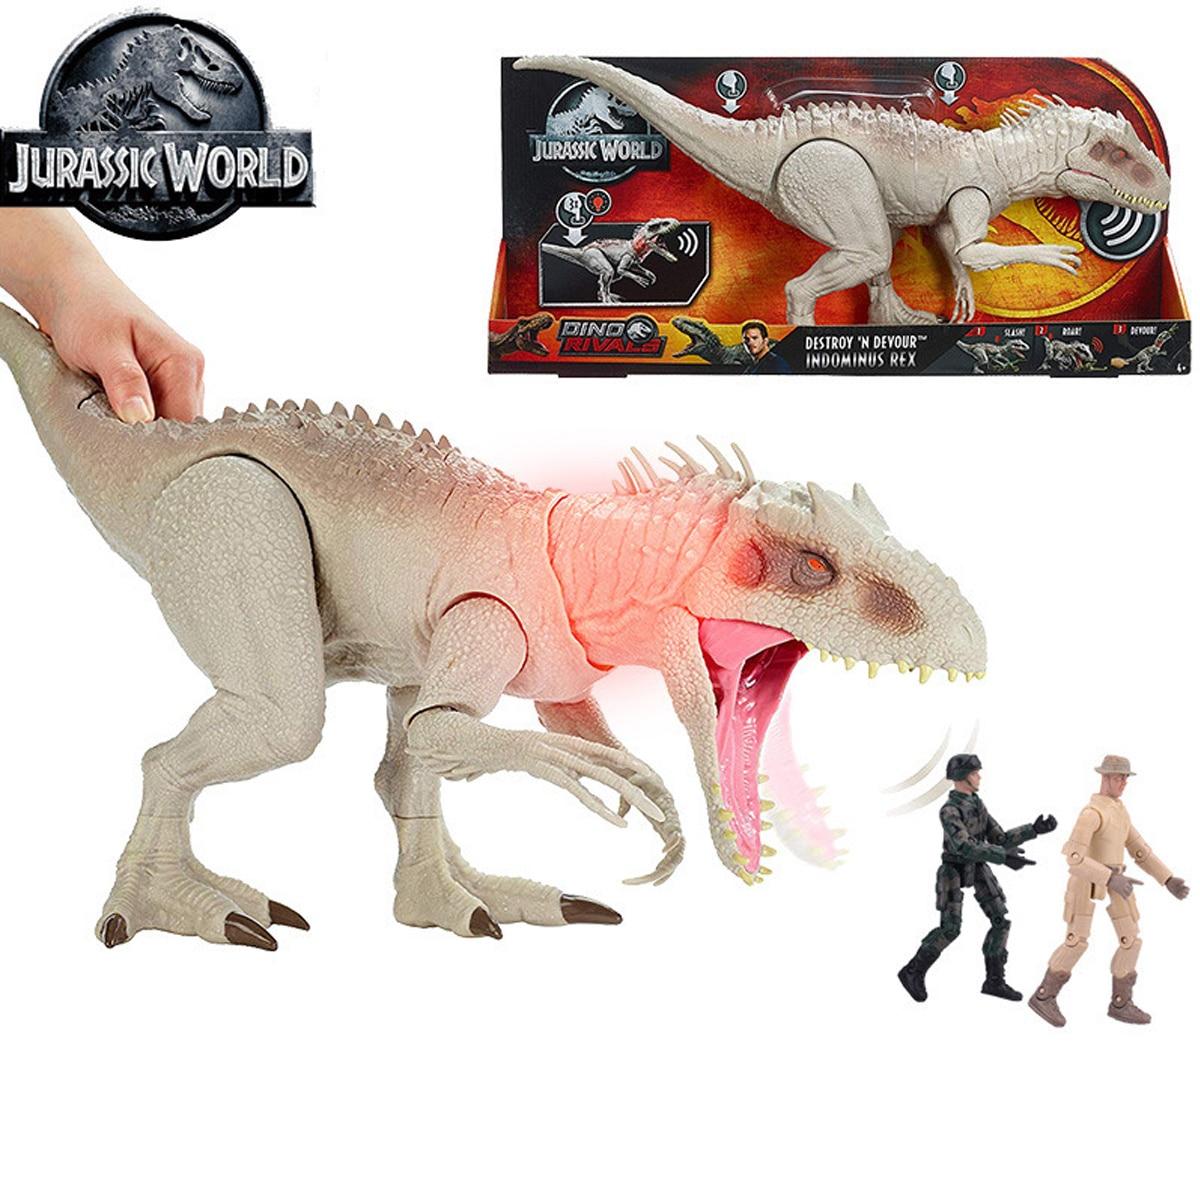 Jurassic World Tyrannosaurus Rex Dinosaurus Speelgoed Indominus Met Chomping Mond Lights & Sounds Voor Kinderen Speelgoed Gift GCT95